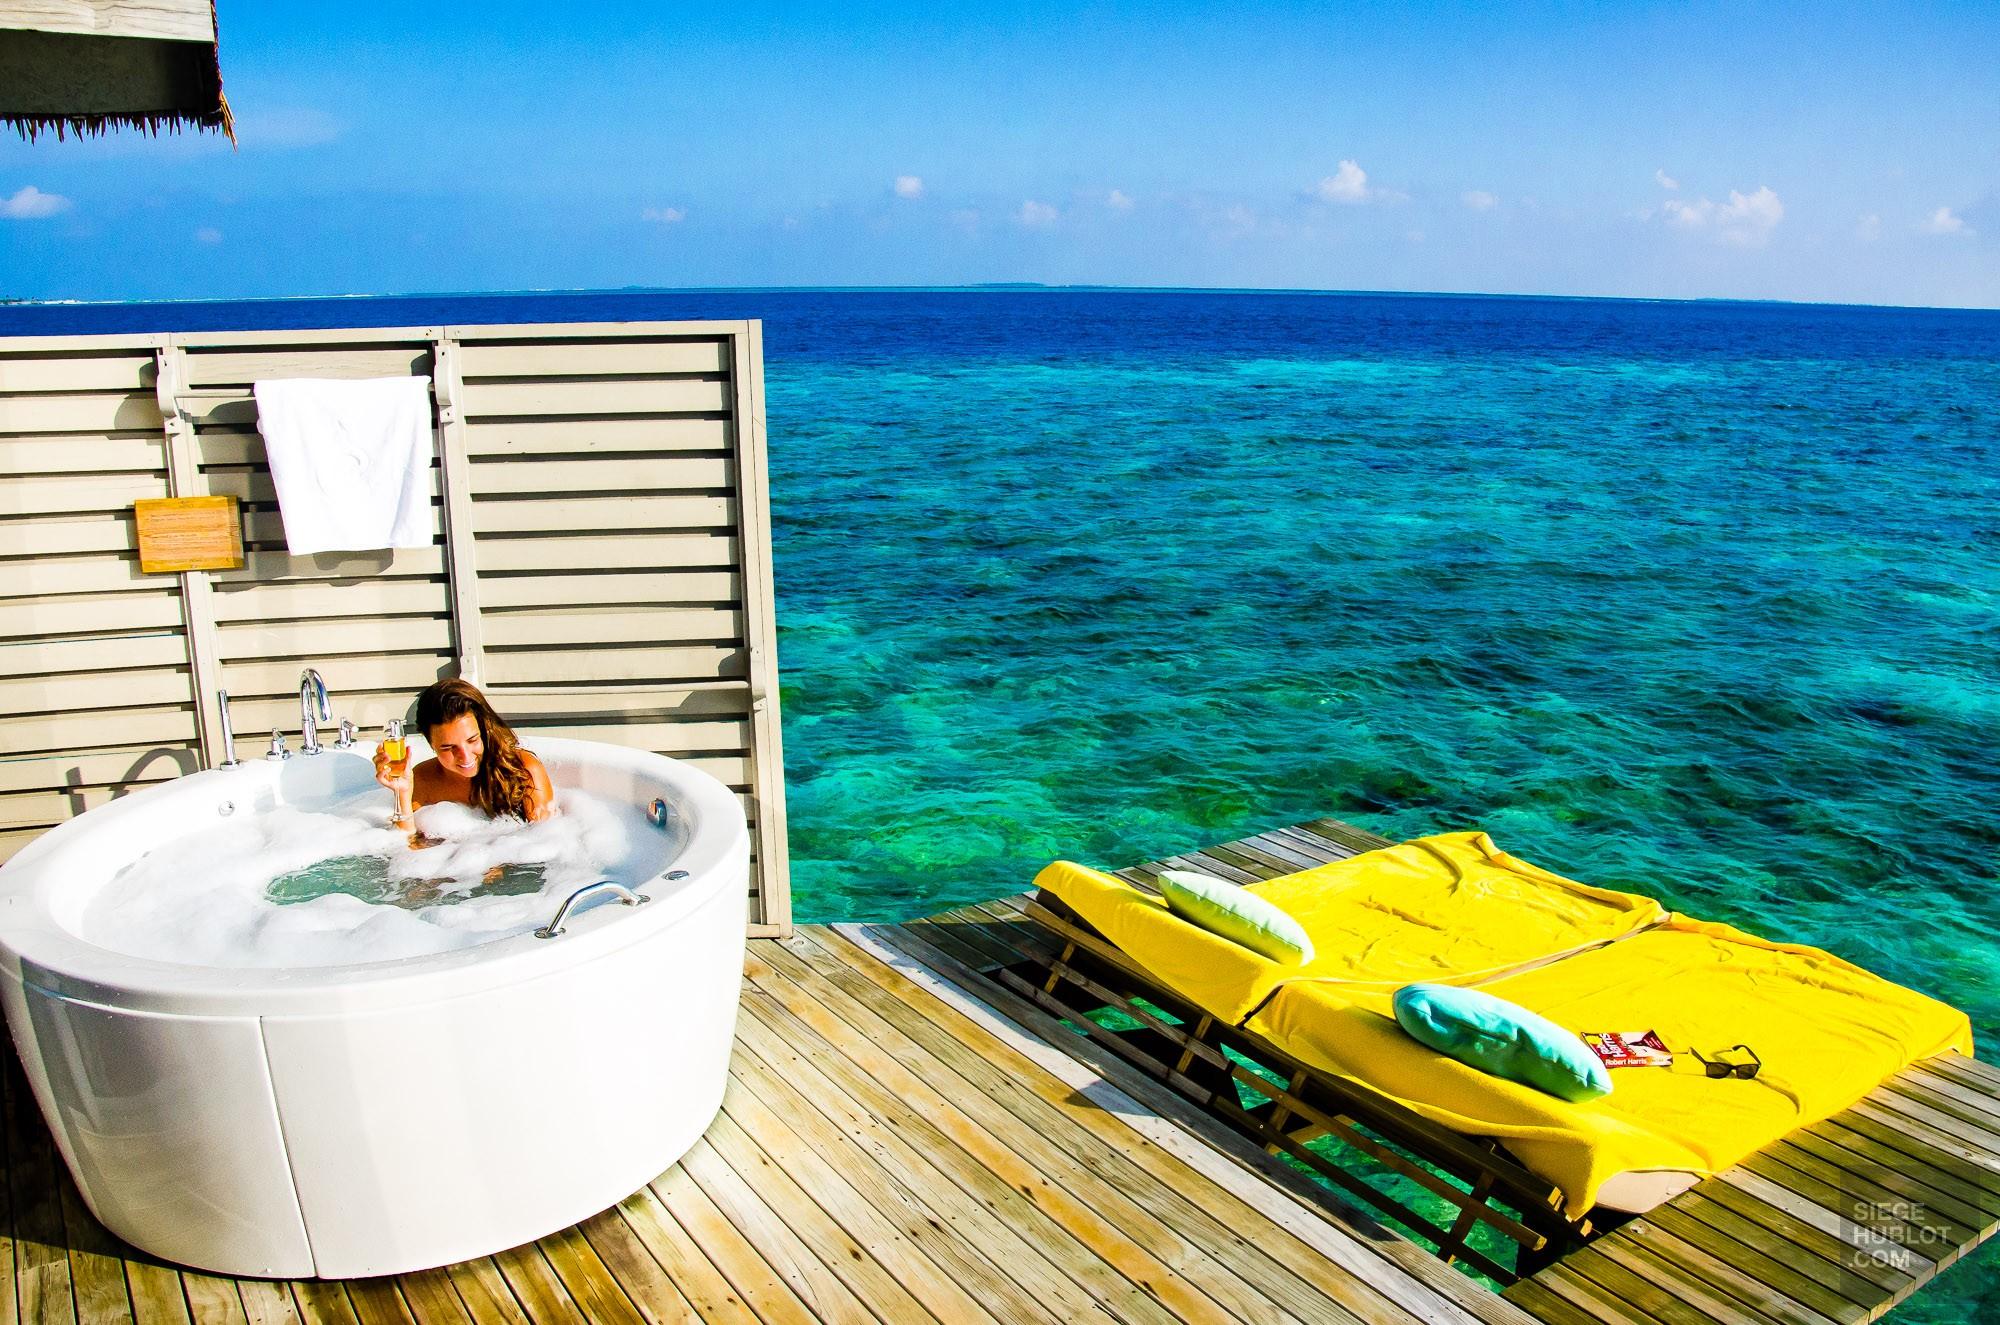 Bain tourbillon mer - Centara ras fushi - Les Maldives, le grand luxe en plein ocean Indien. - Asie, Maldives